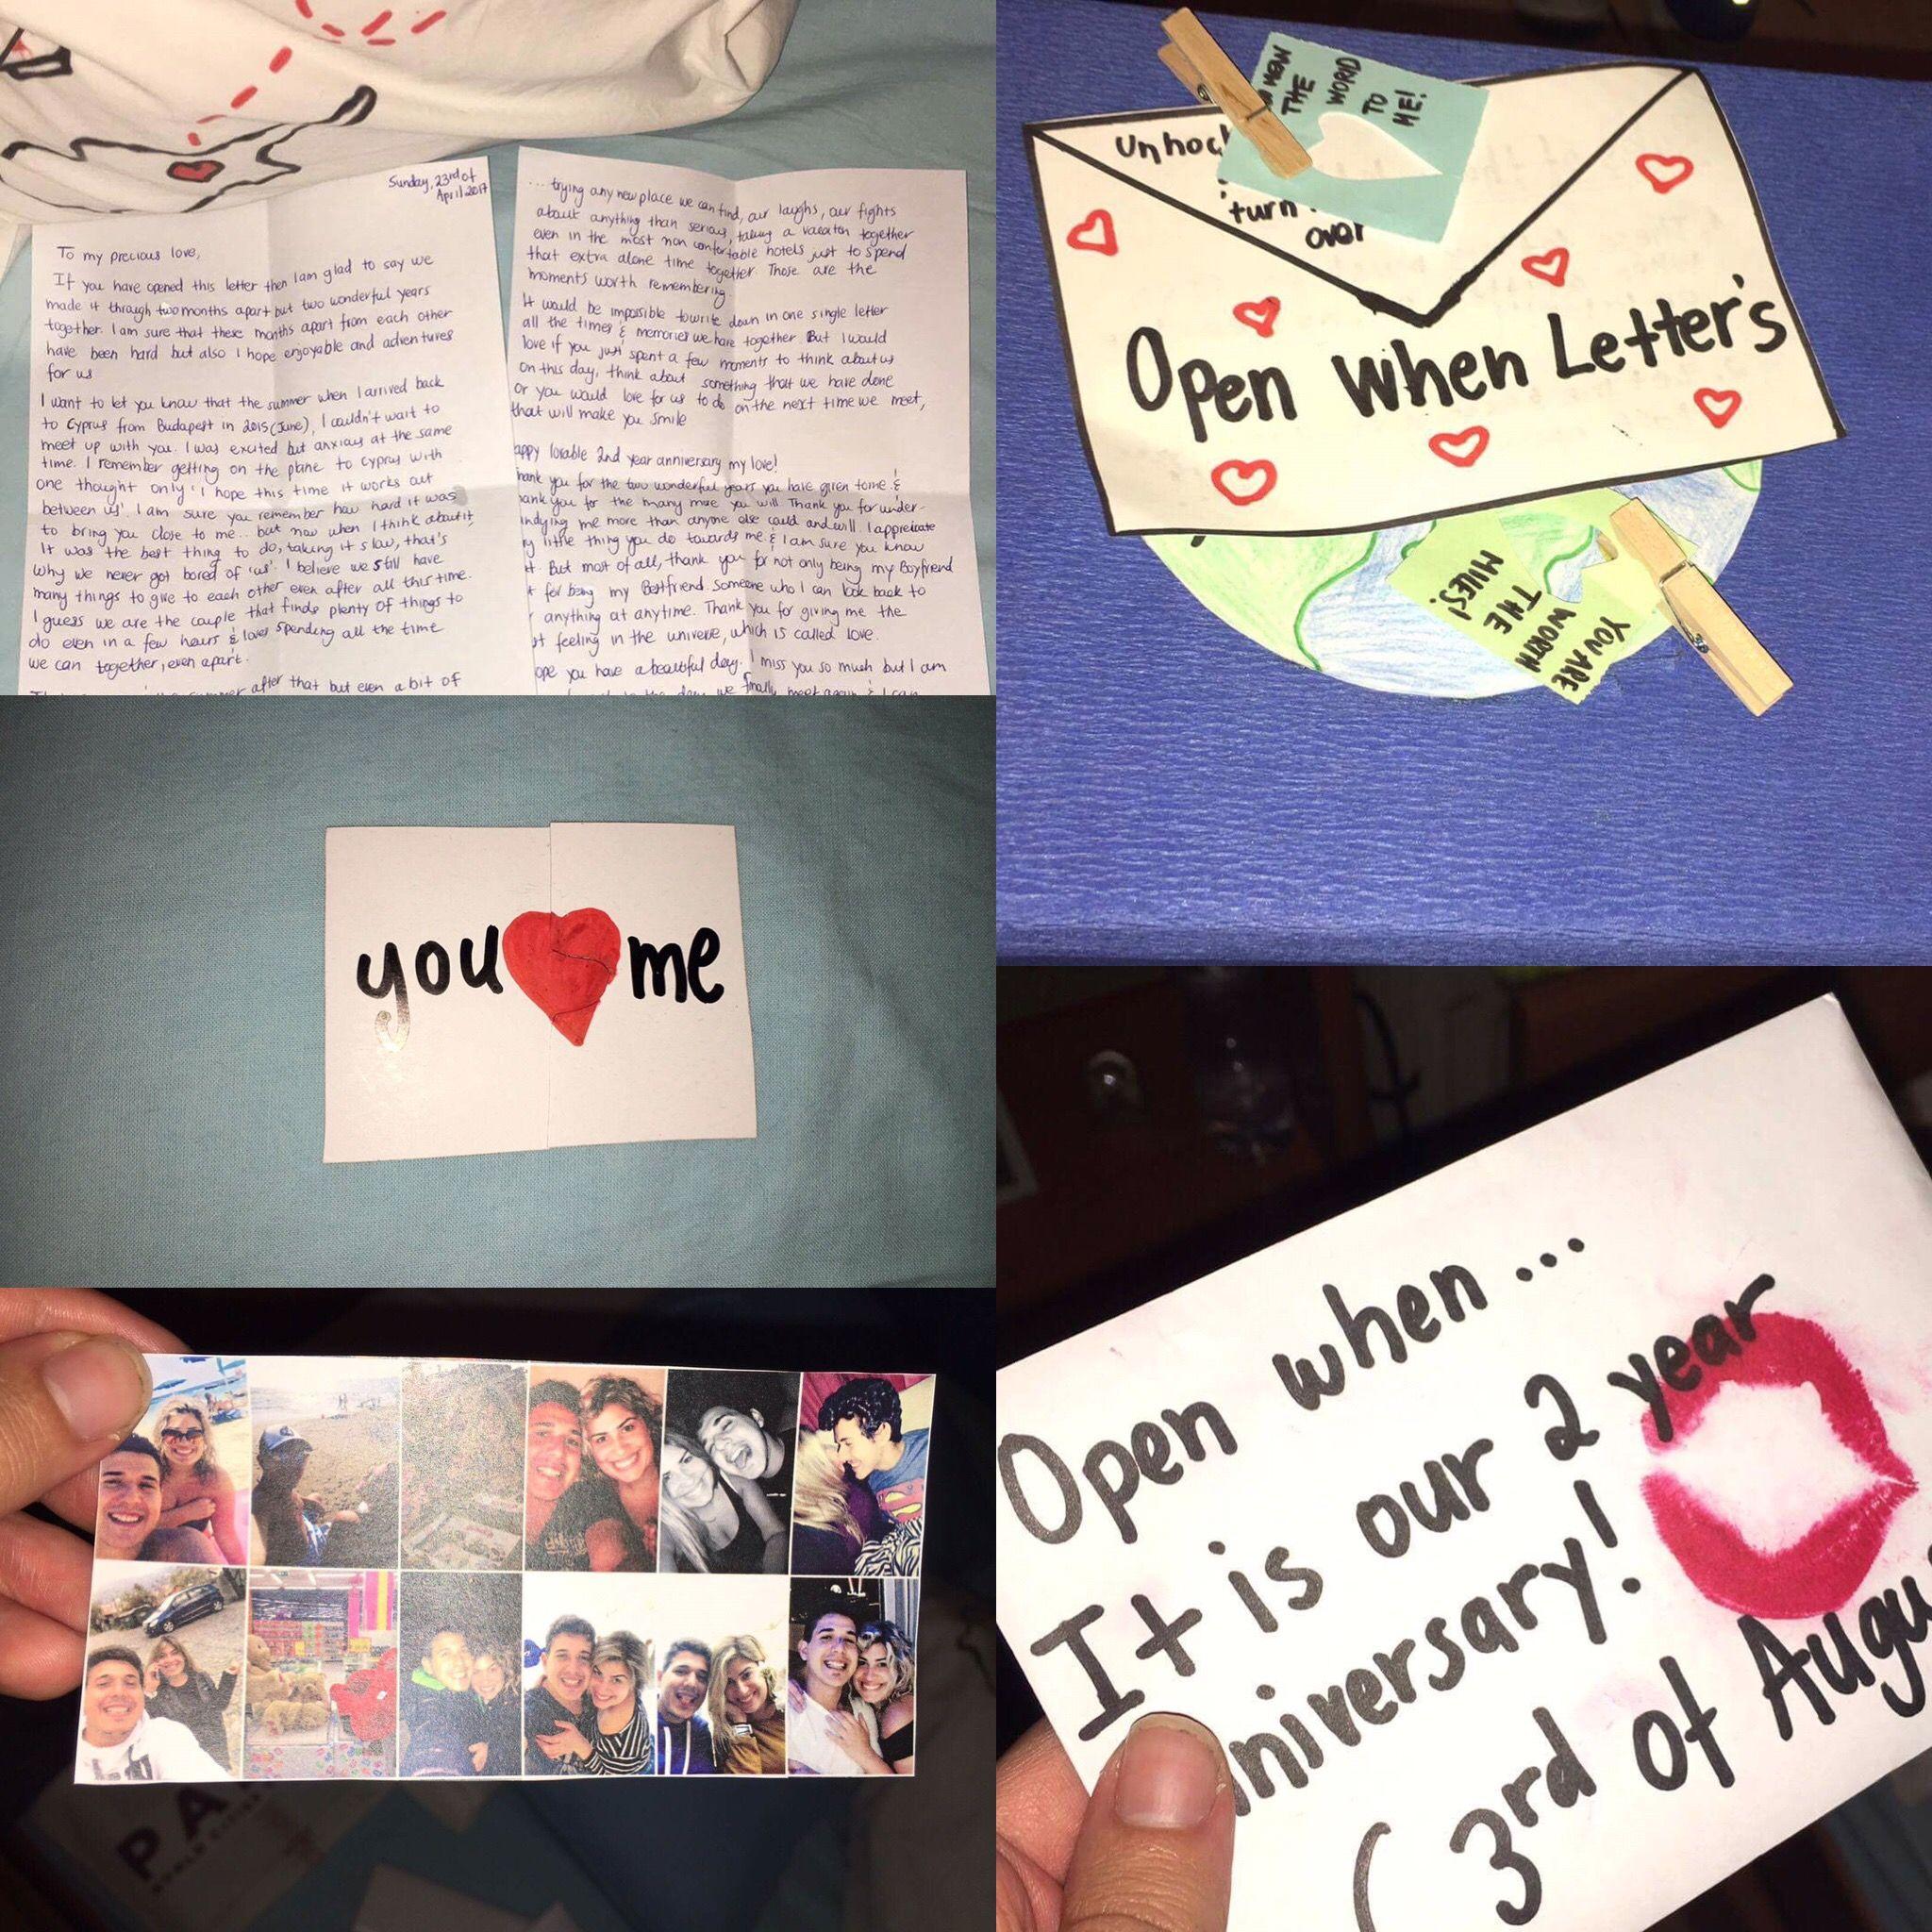 2 year anniversary creation gift for my boyfriend ️ Open